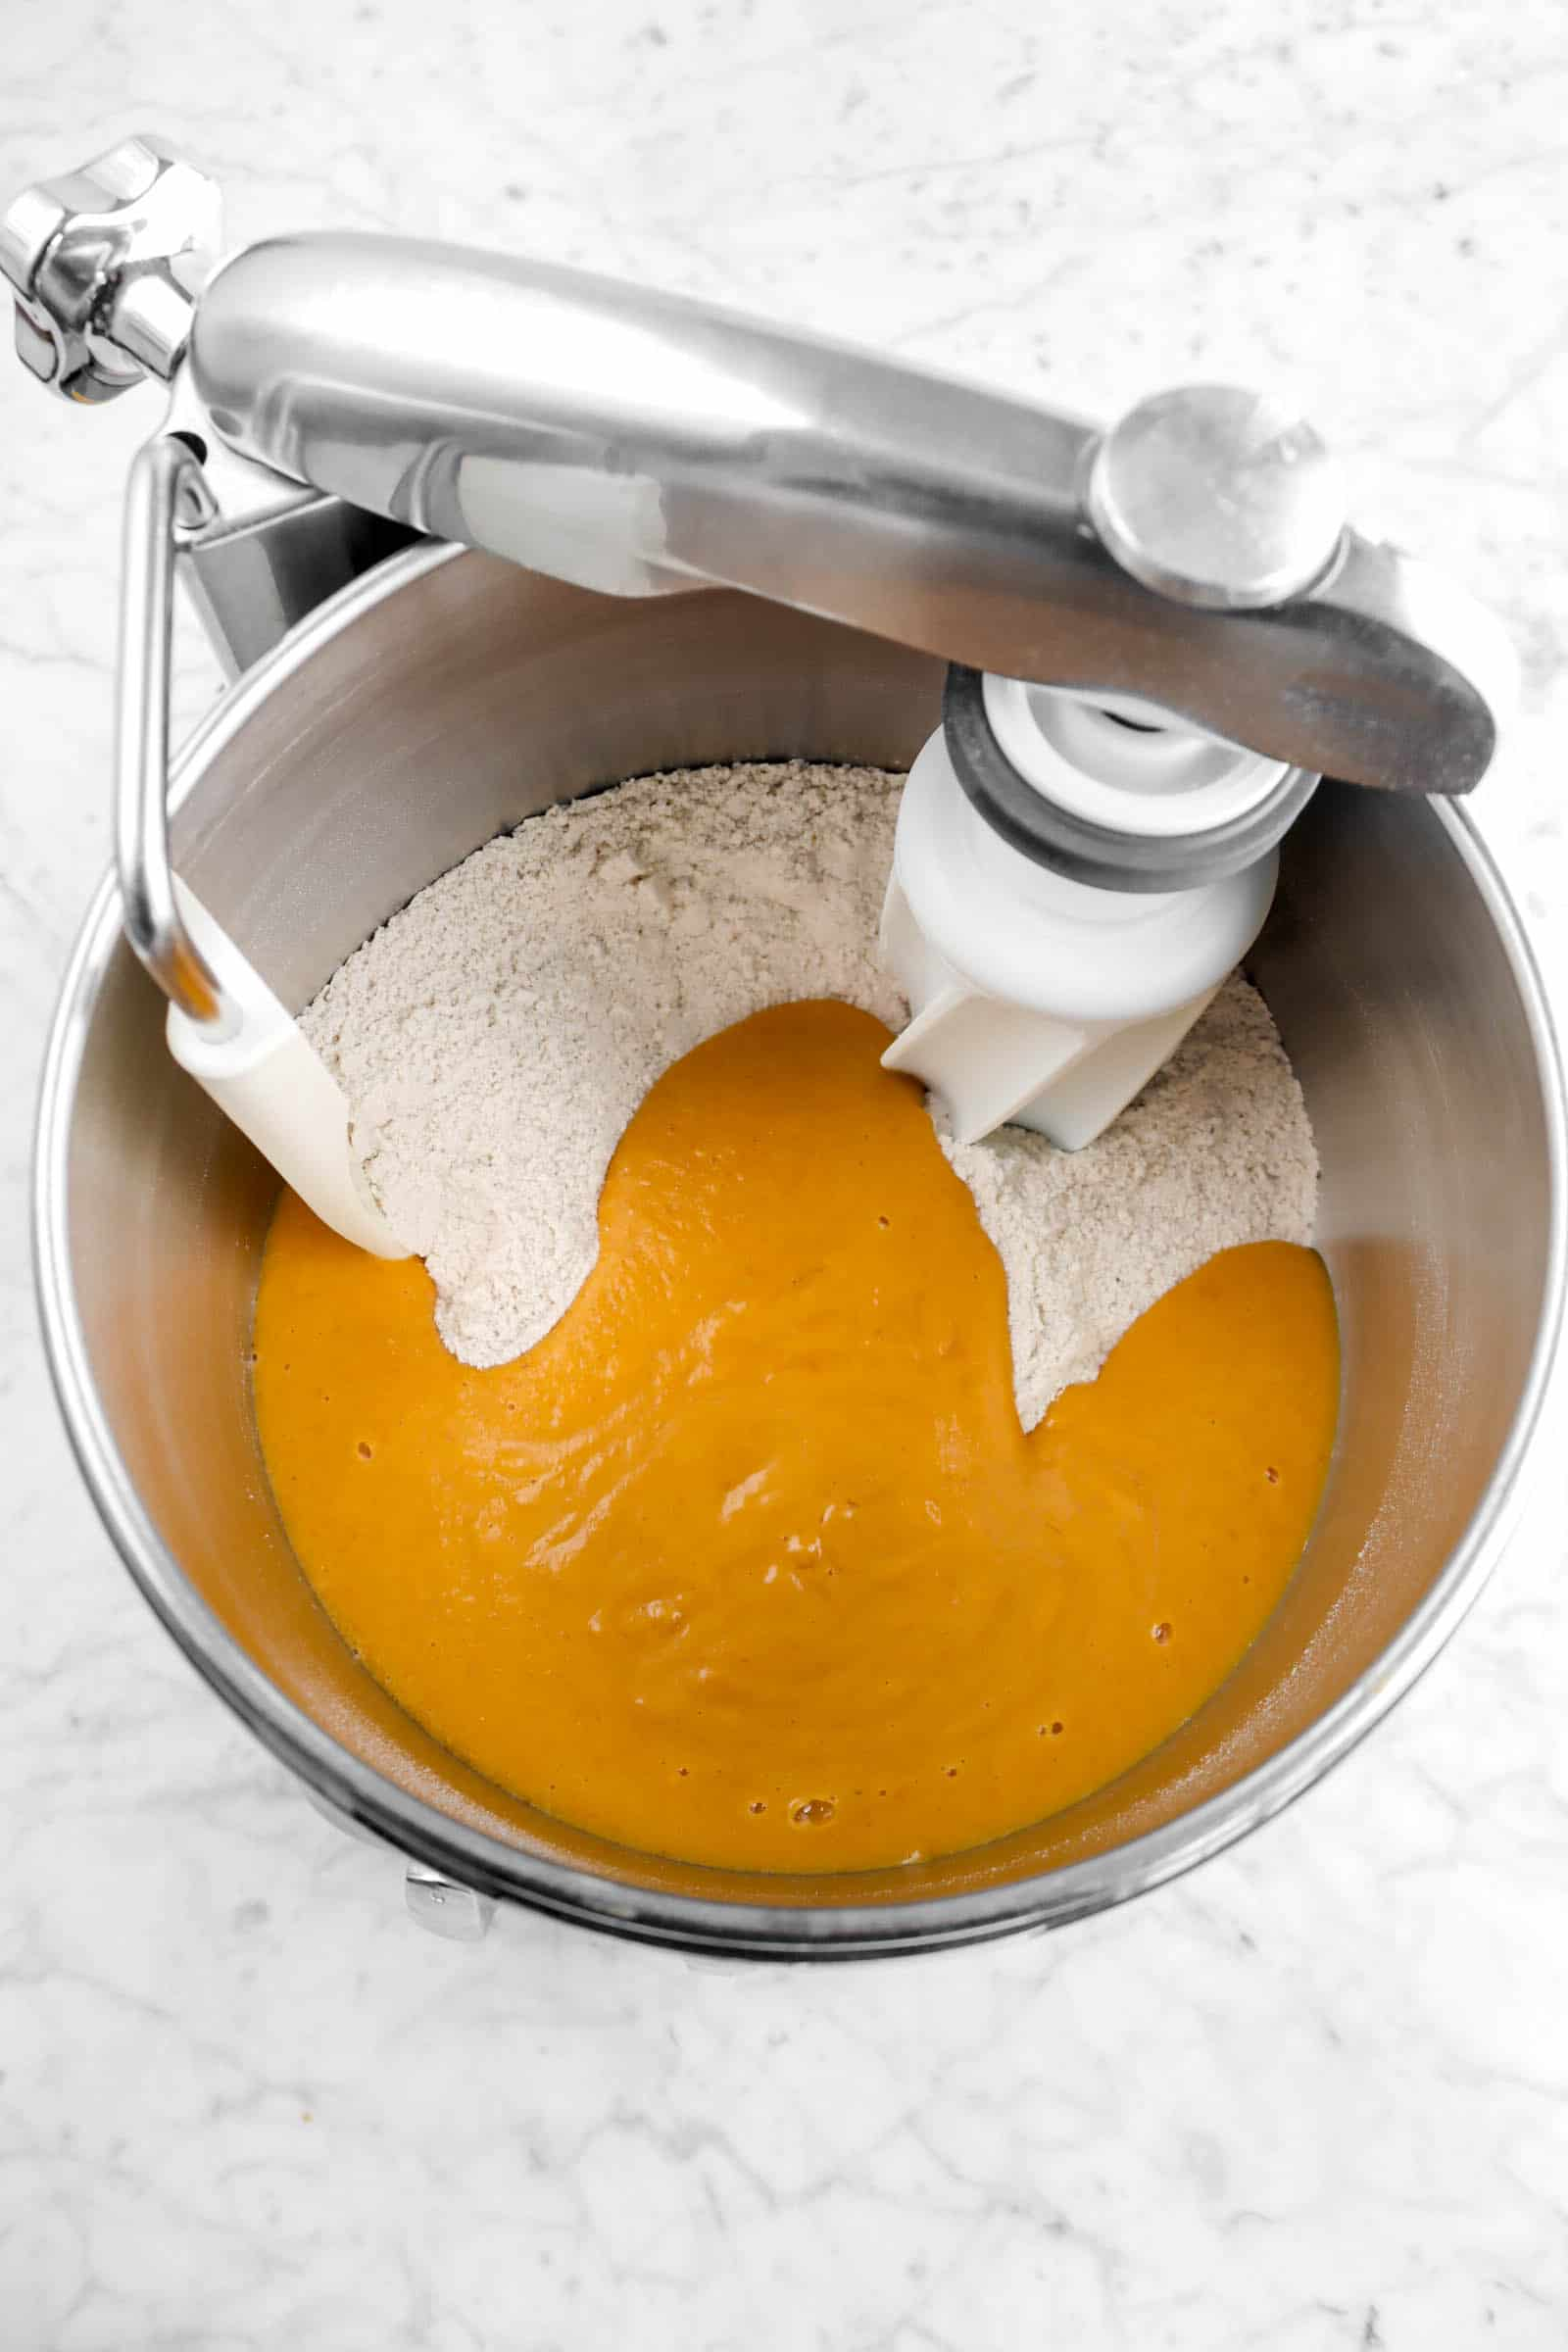 pumpkin mixture added to dry ingredients